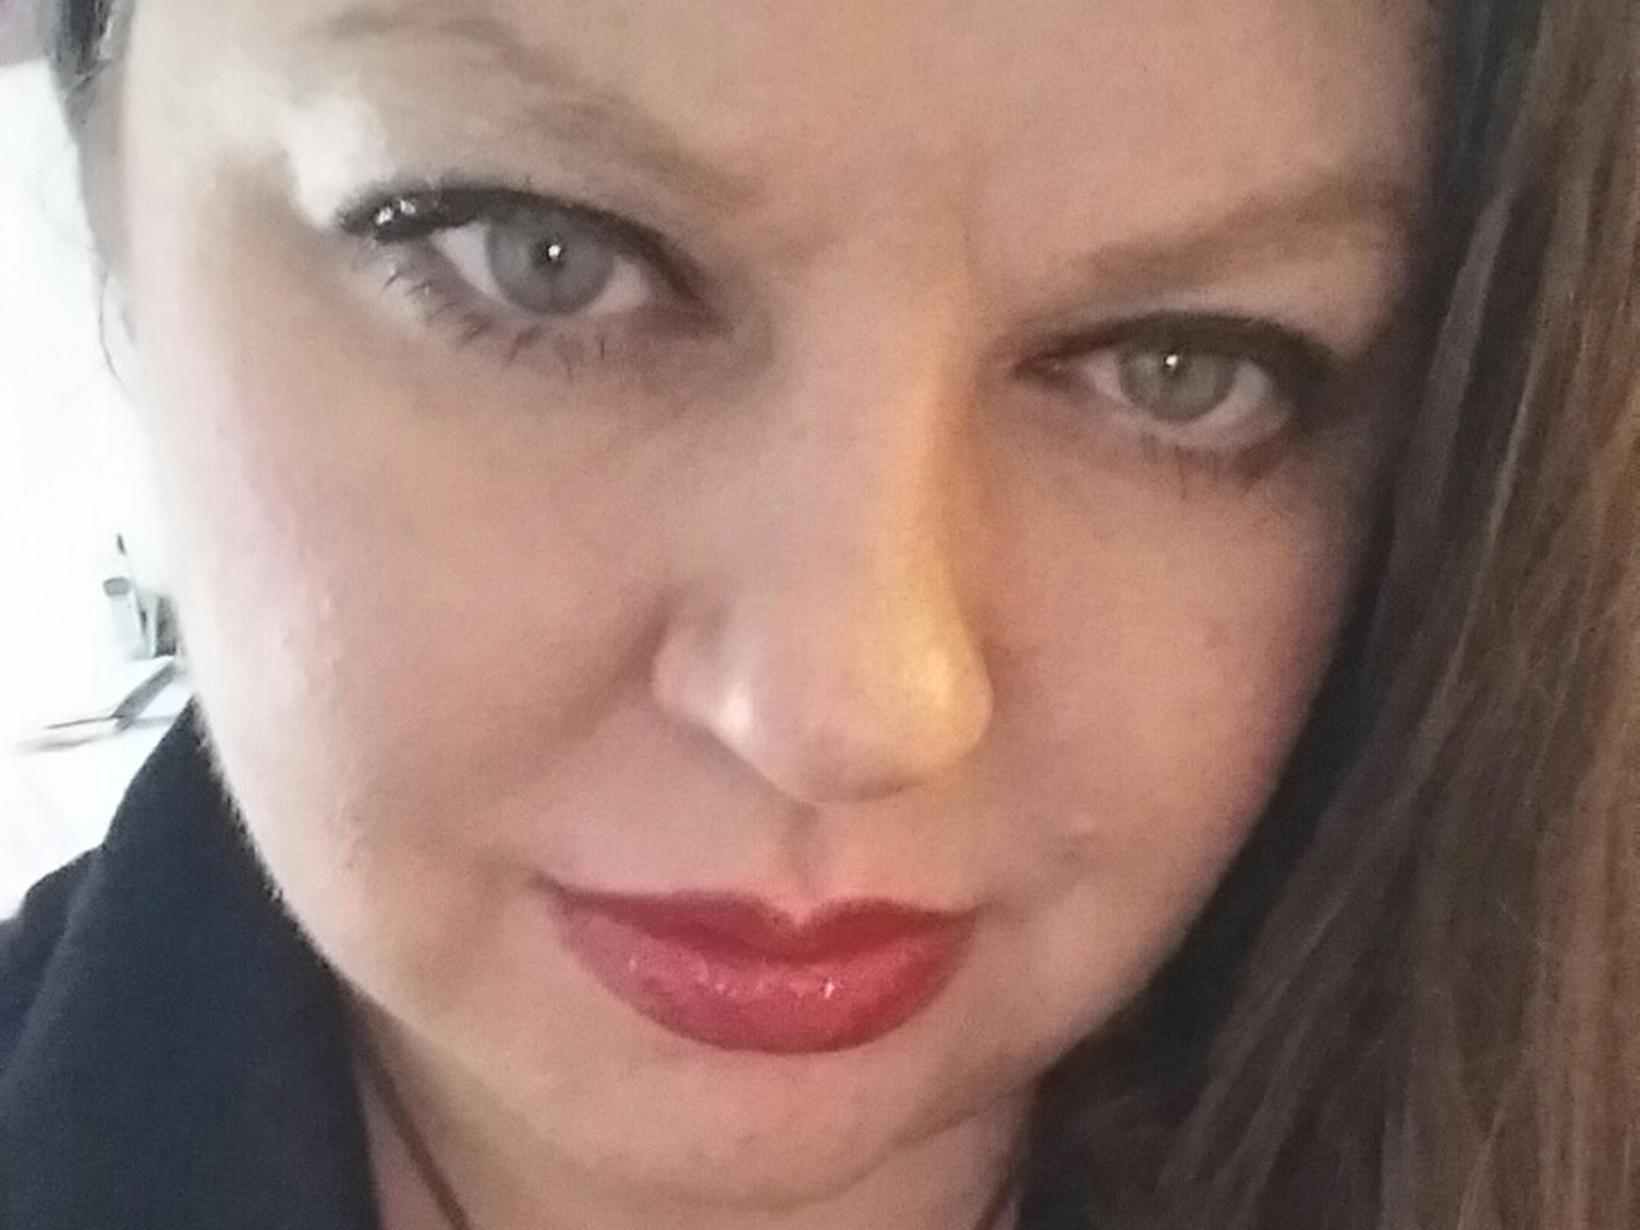 Tijana from Adelaide, South Australia, Australia